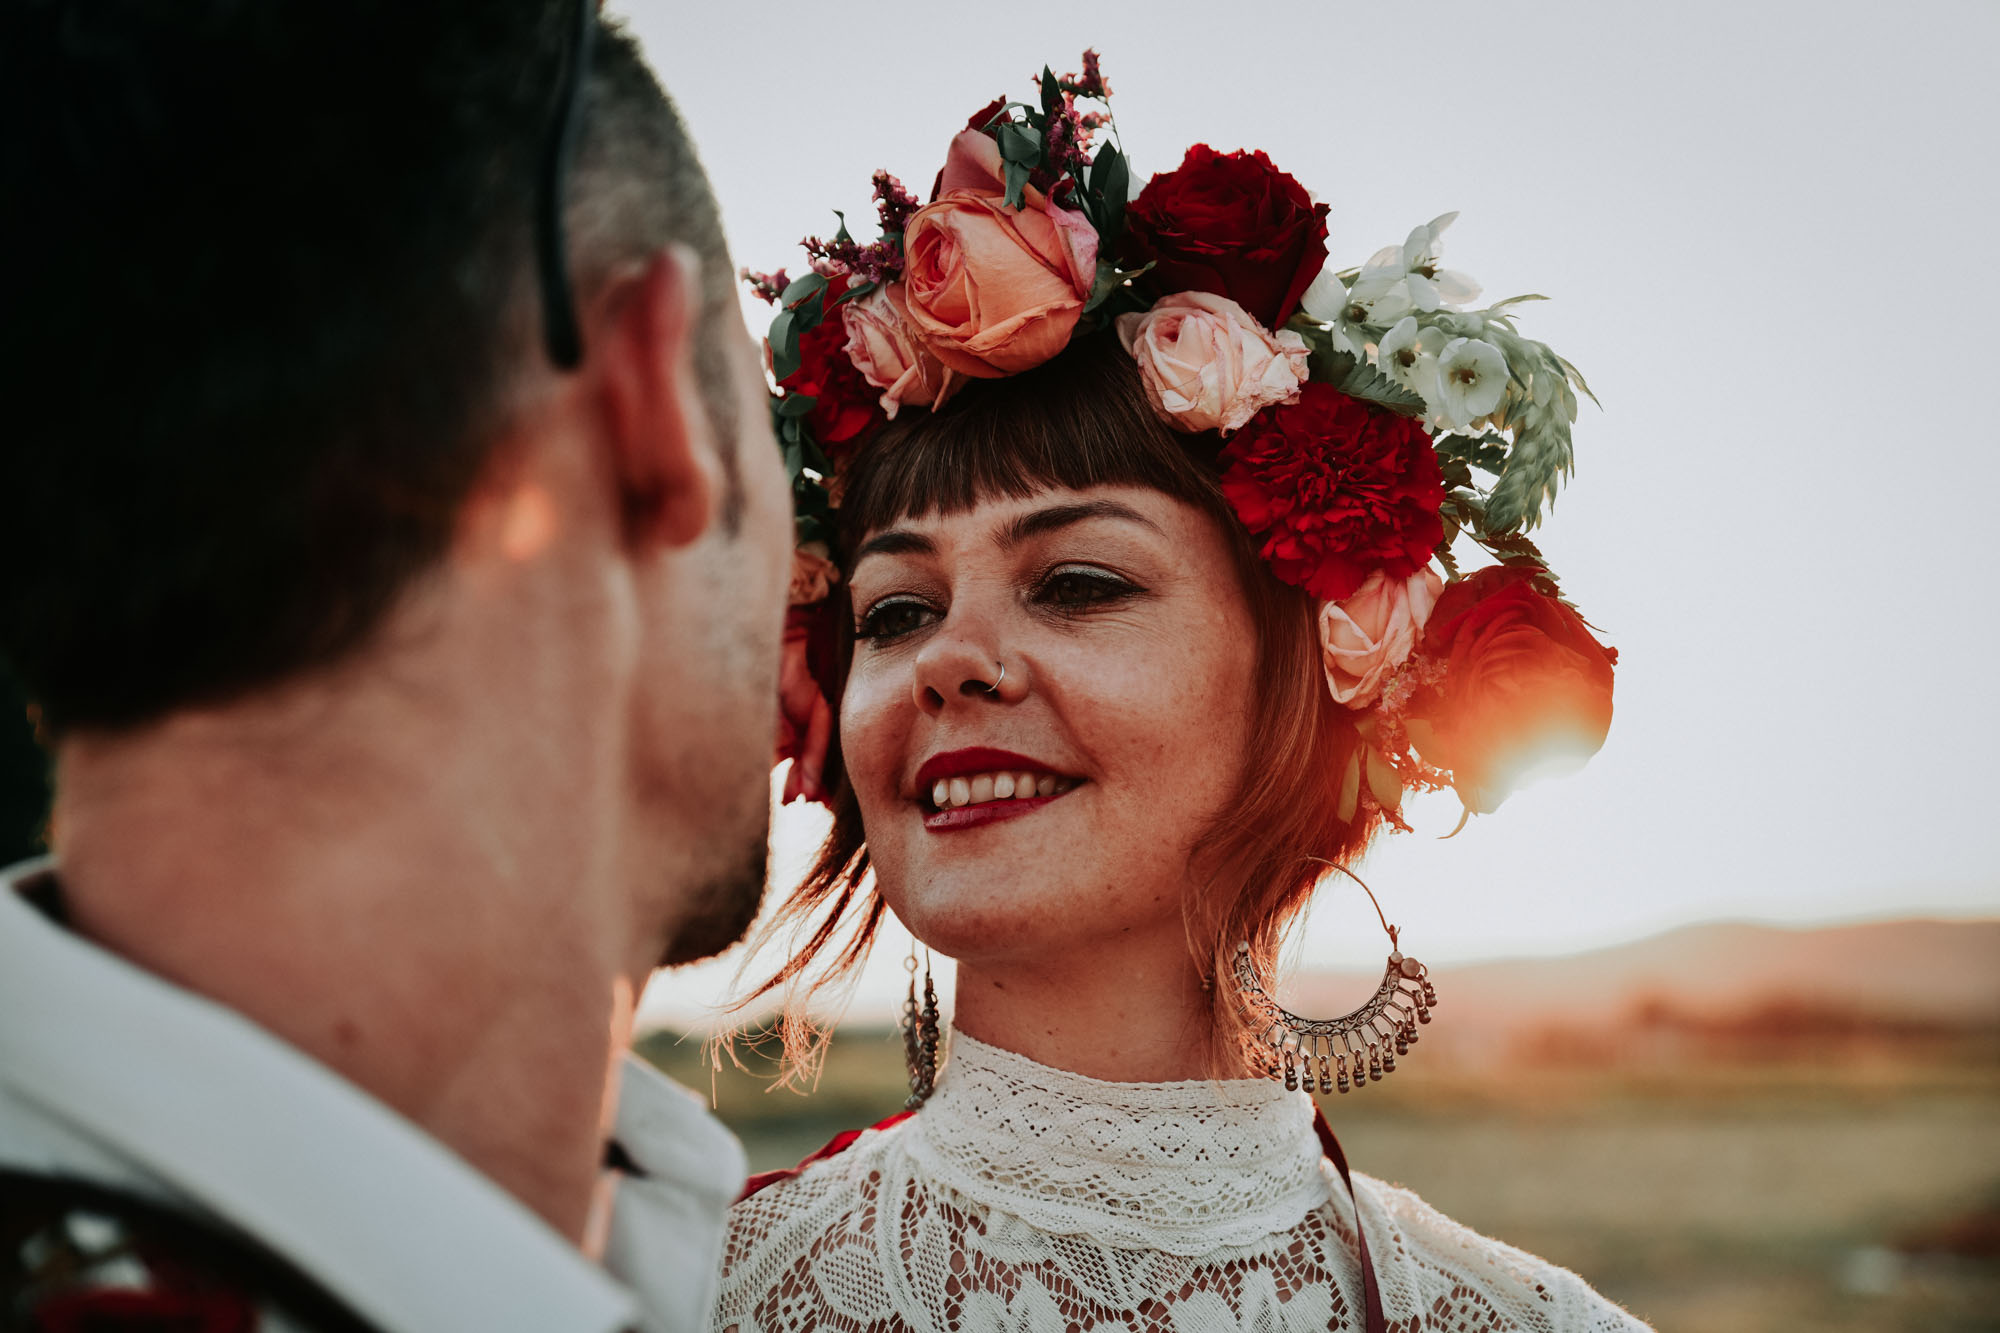 2018-08-04 - LD8_3169 - photographe mariage lyon - laurie diaz - www.lauriediazweeding.com.jpg